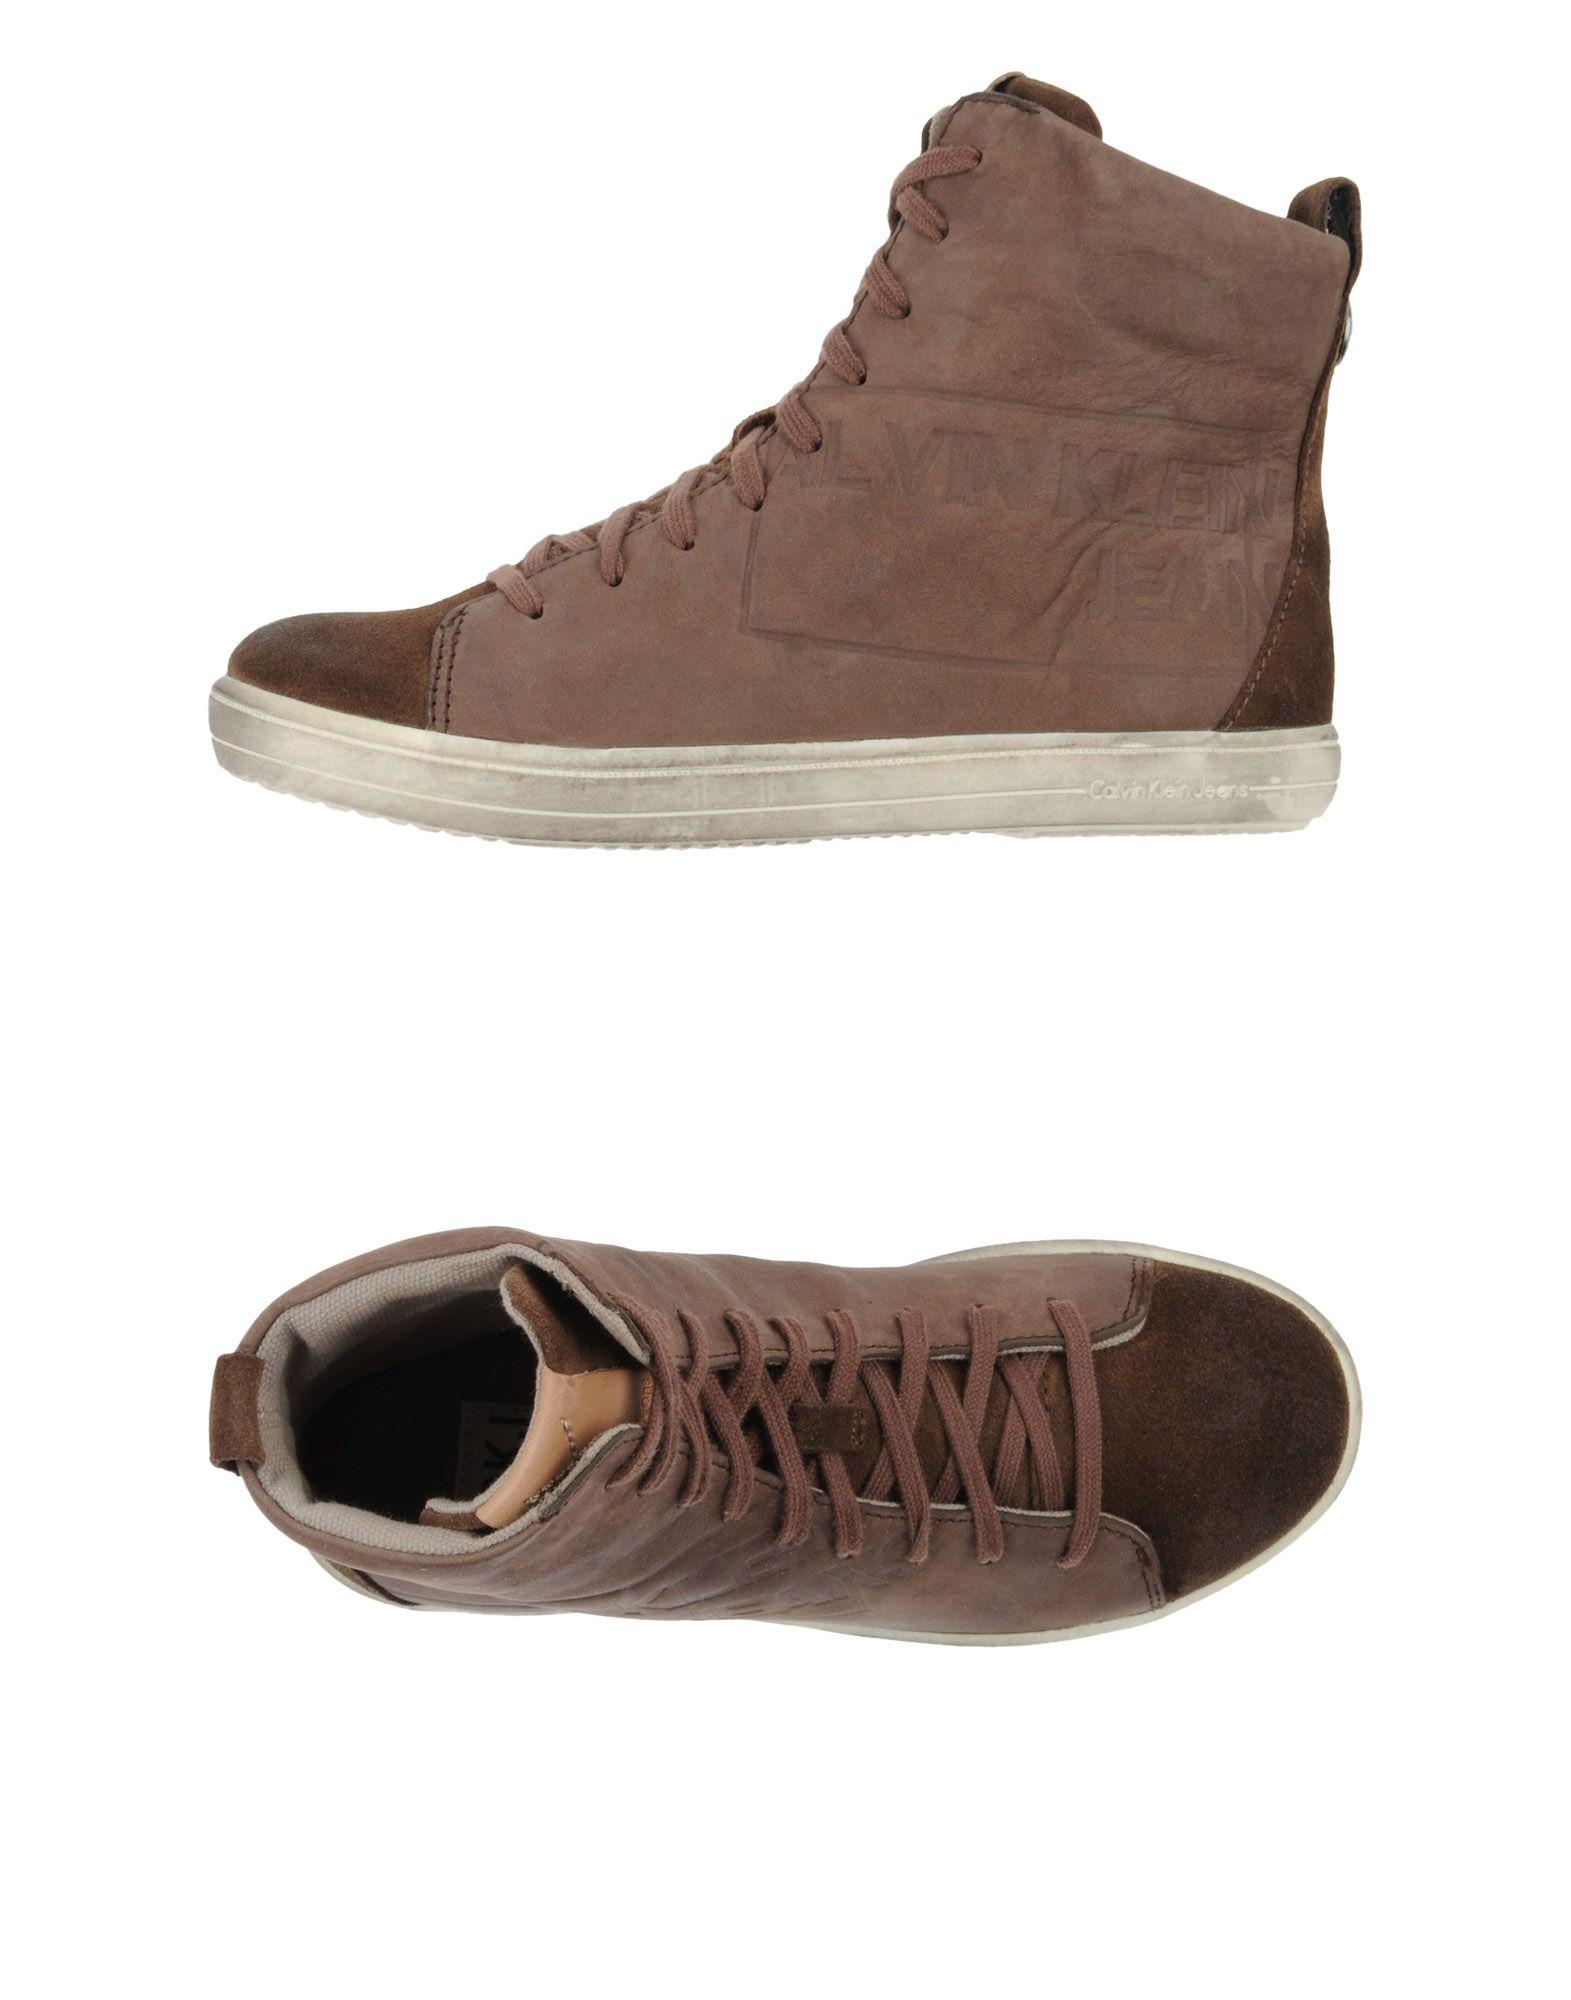 calvin klein jeans brown high tops trainers for men lyst. Black Bedroom Furniture Sets. Home Design Ideas